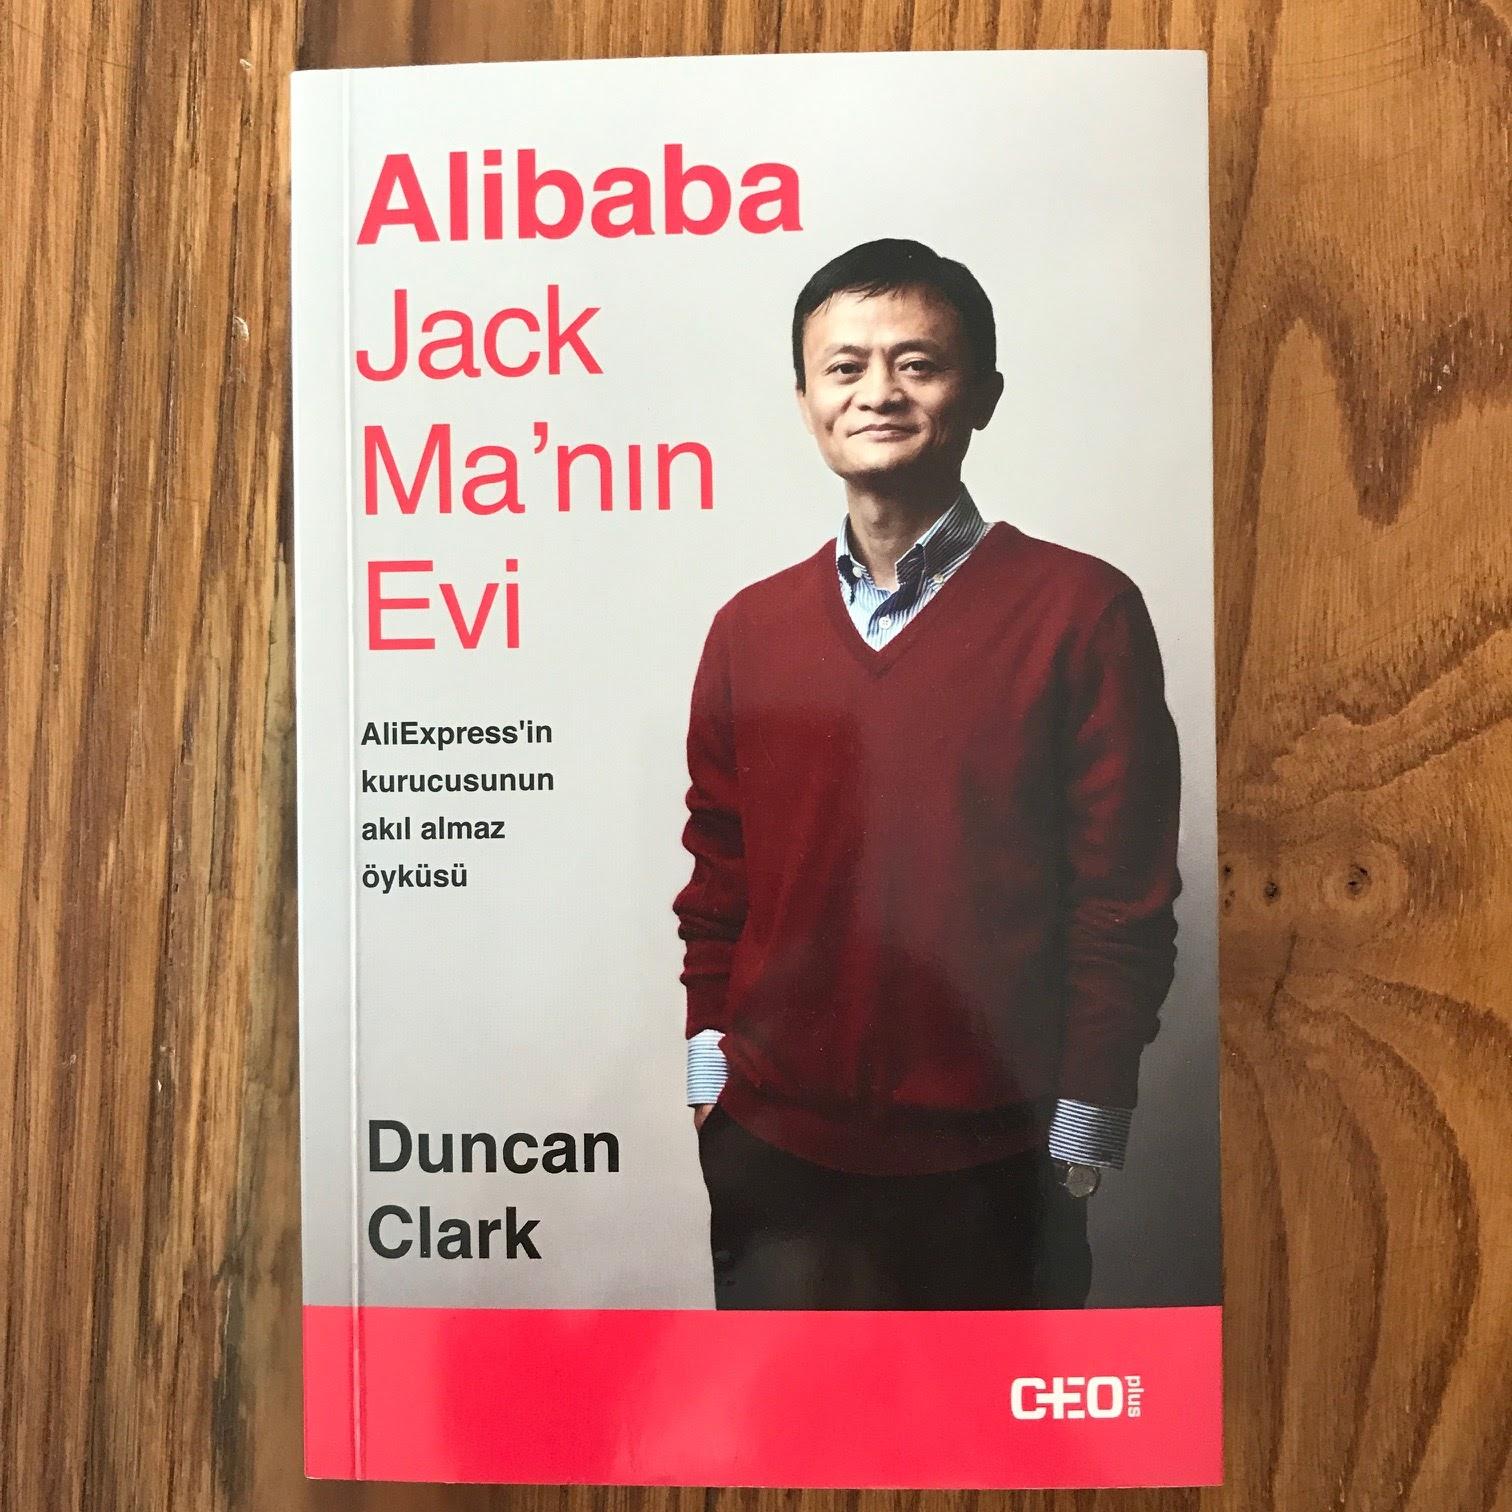 Alibaba Jack Ma'nin Evi - Aliexpress'in Kurucusunun Akil Almaz Oykusu